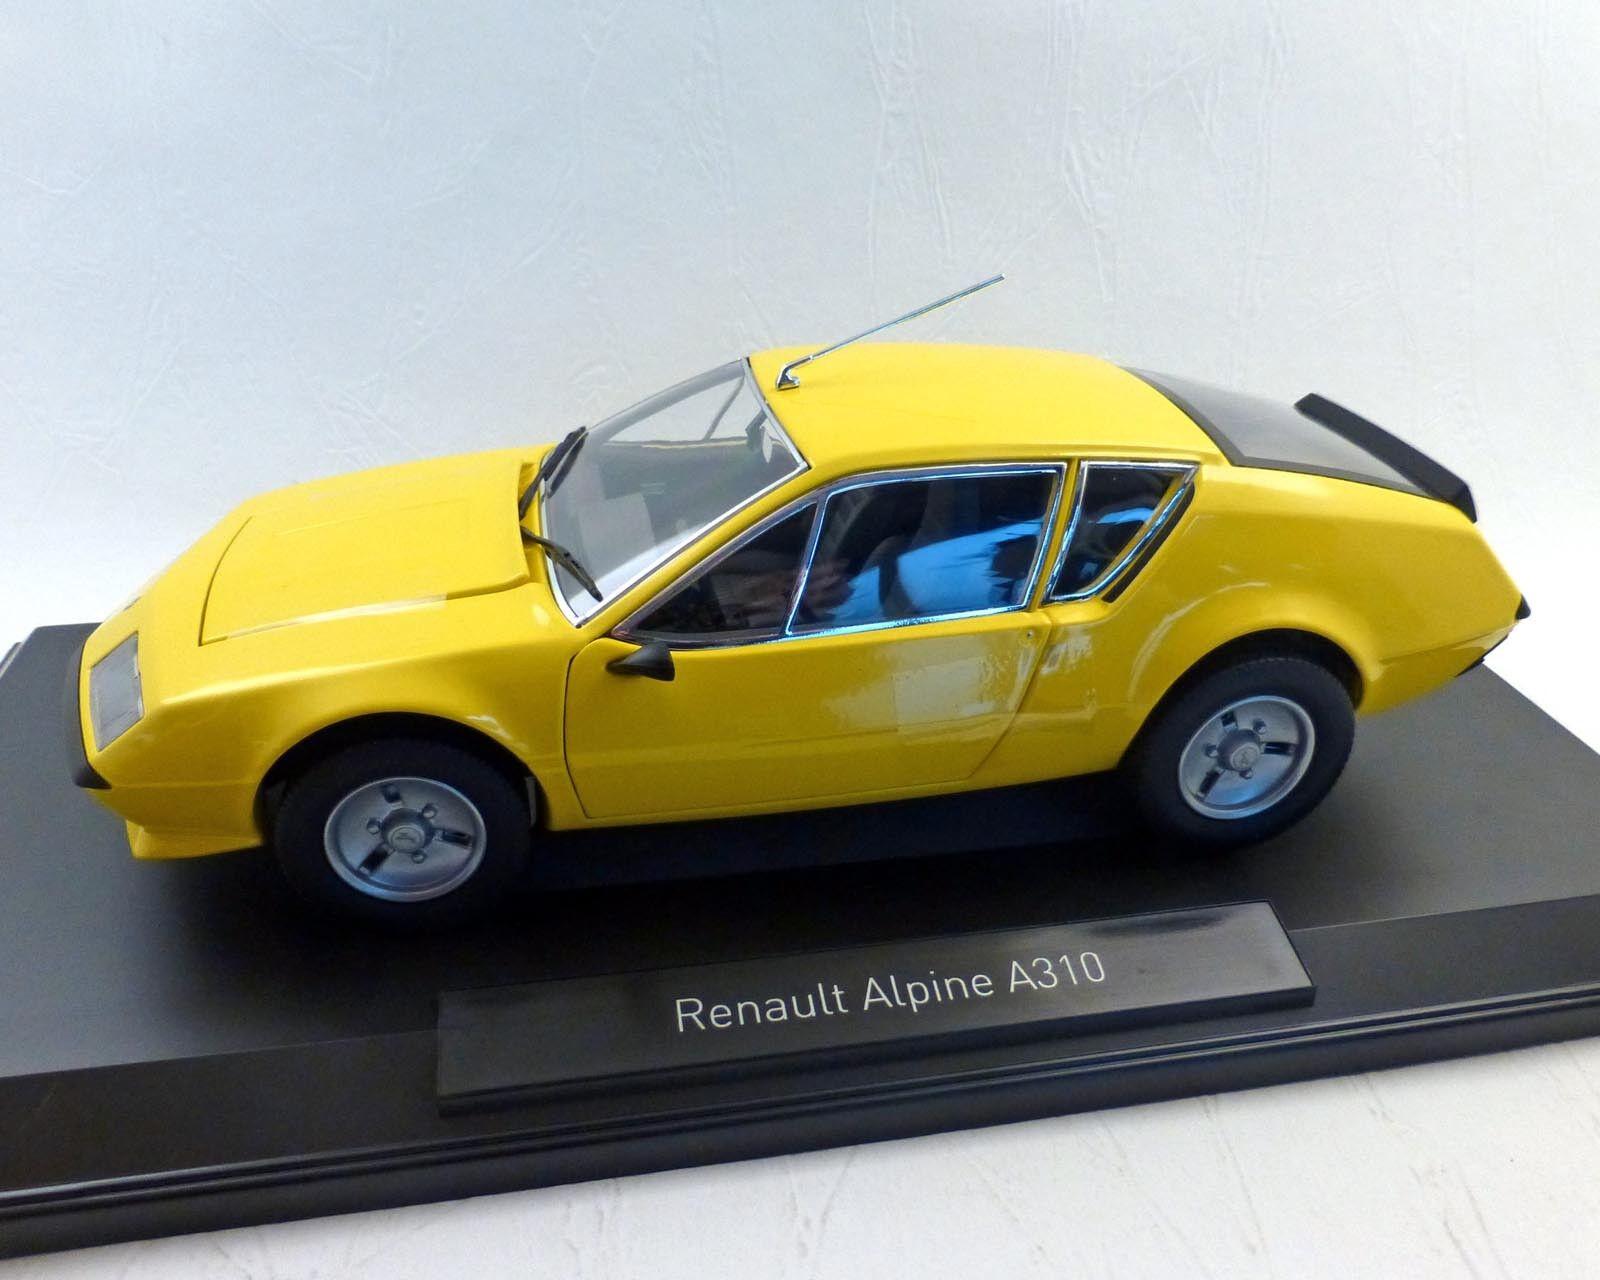 Joyeux noel RENAULT alpine alpine alpine a310 - 1977, jaune, 1:18 - NOREV 0e57d8